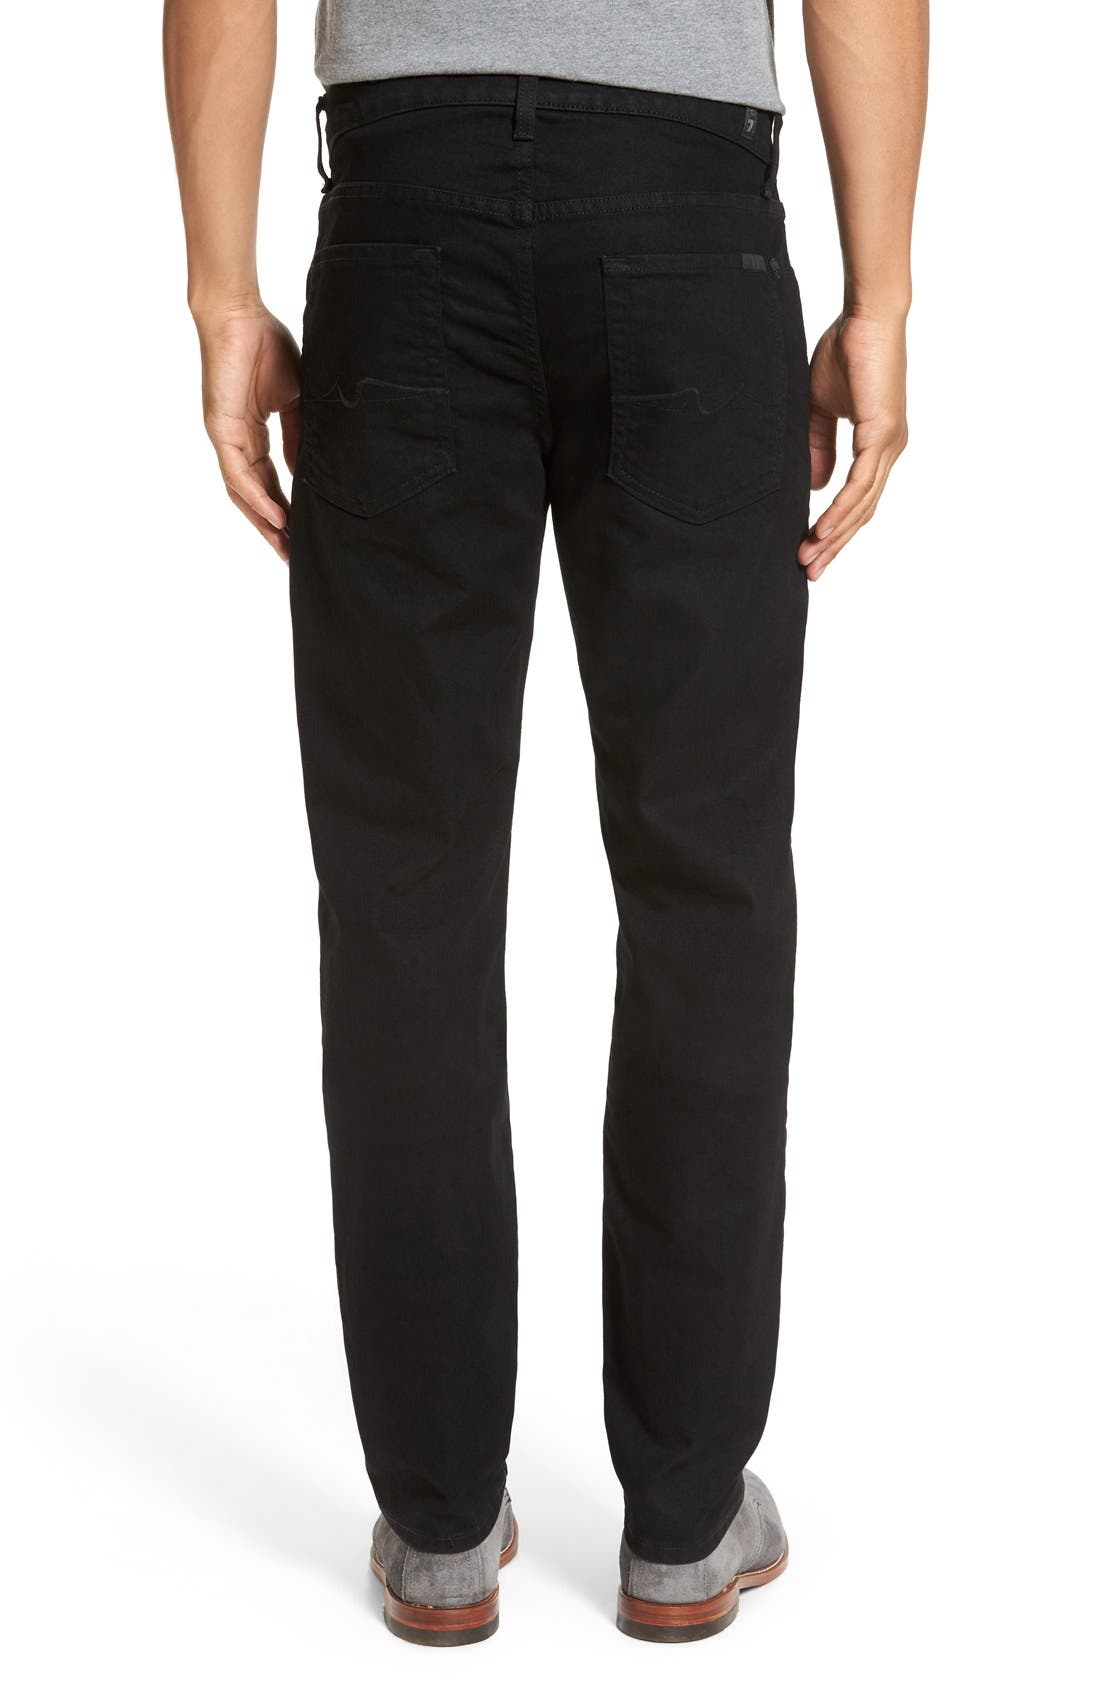 Alternate Image 2  - 7 For All Mankind® Slimmy Slim Fit Jeans (Towne Black)